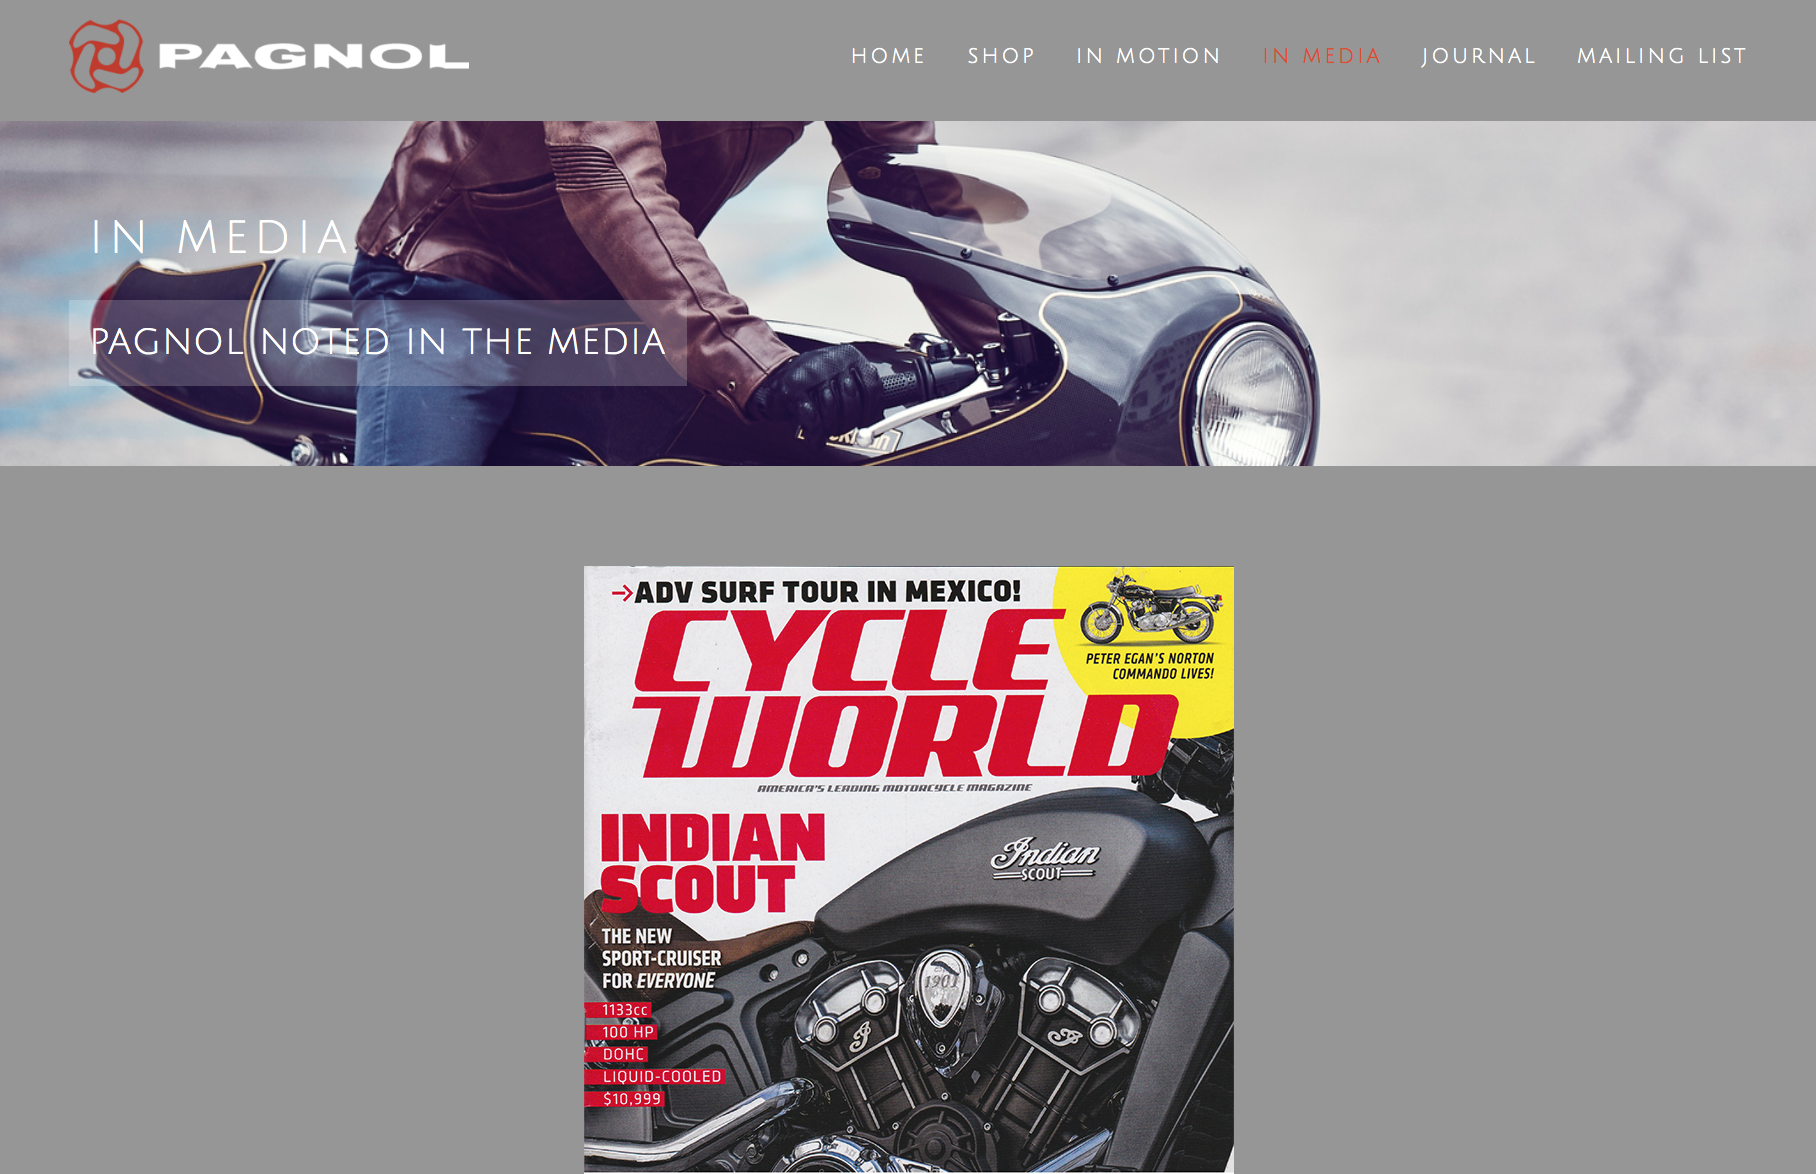 www.Pagnol-Moto.com